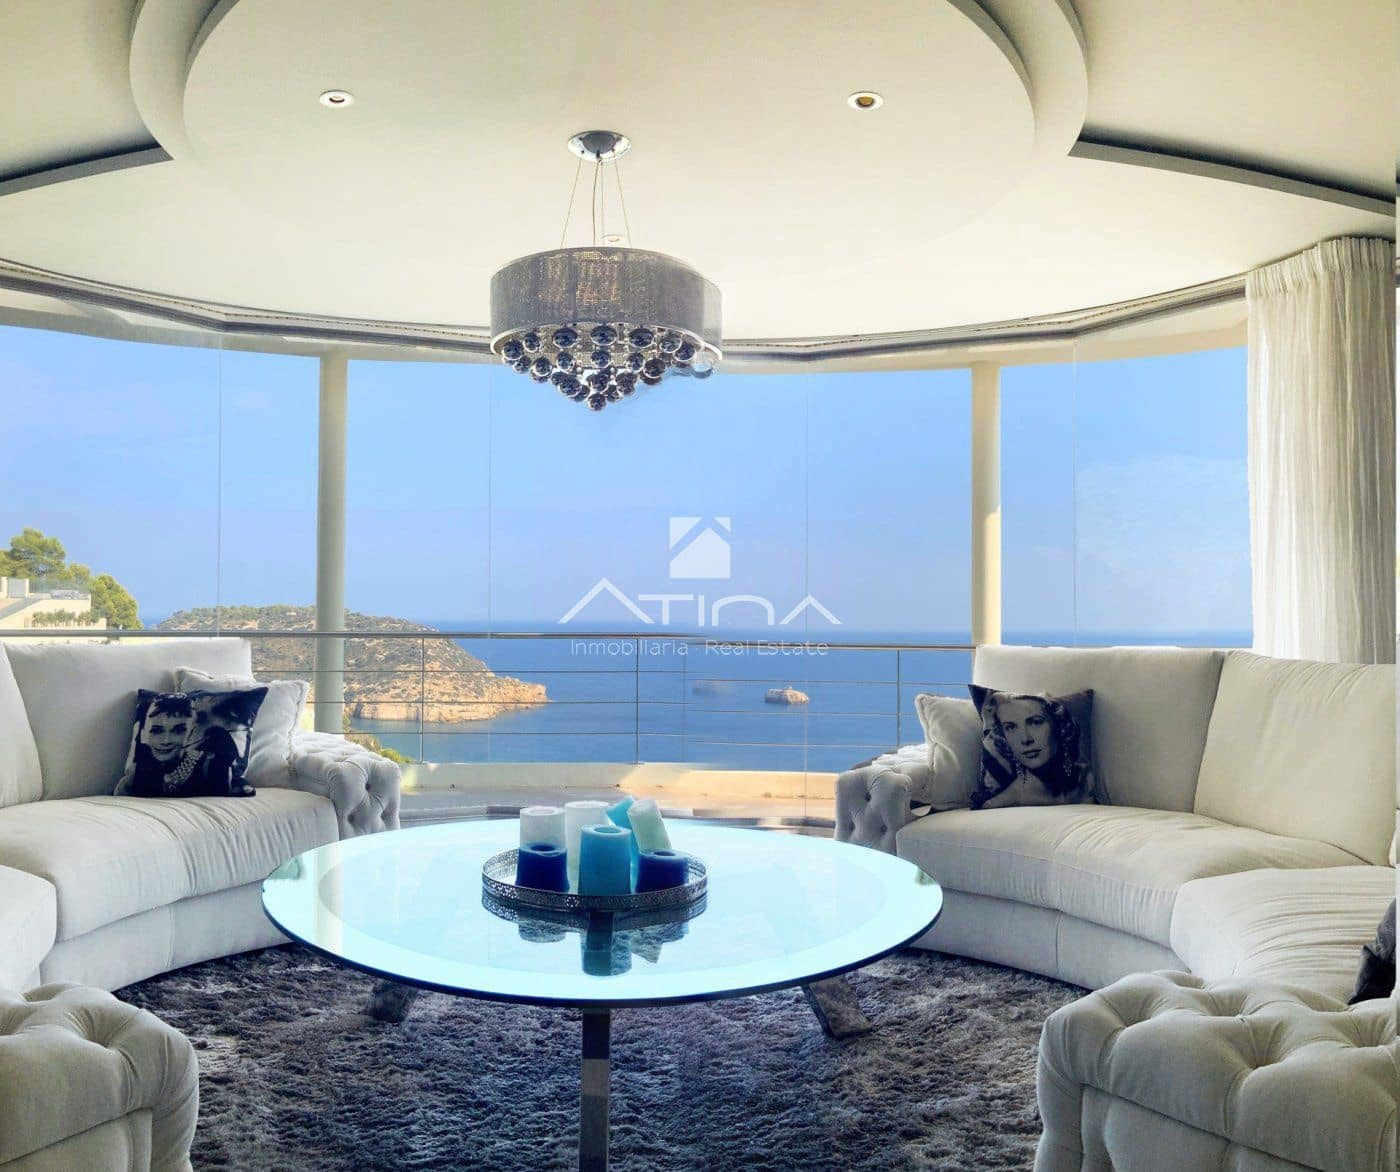 3 bedroom Villa for sale in Javea / Xabia with pool garage - € 1,295,000 (Ref: 6254896)